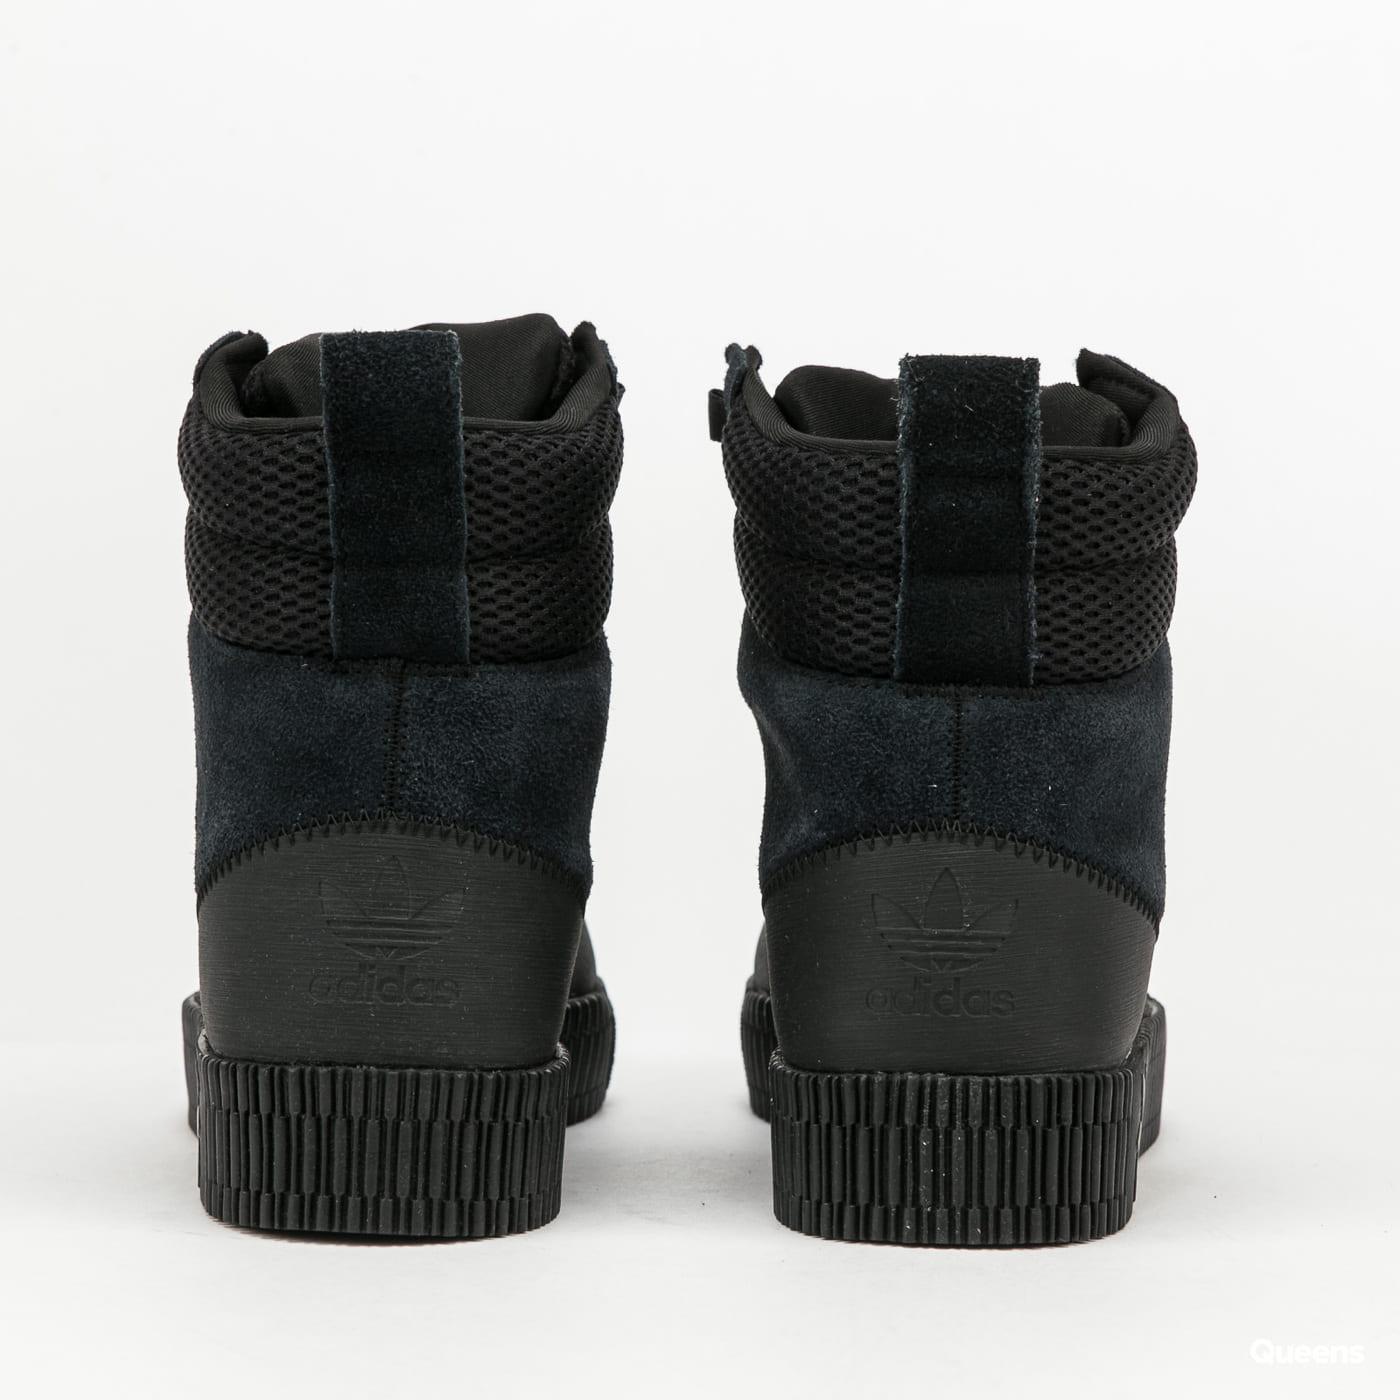 adidas Originals Samba Boot W cblack / cblack / cblack